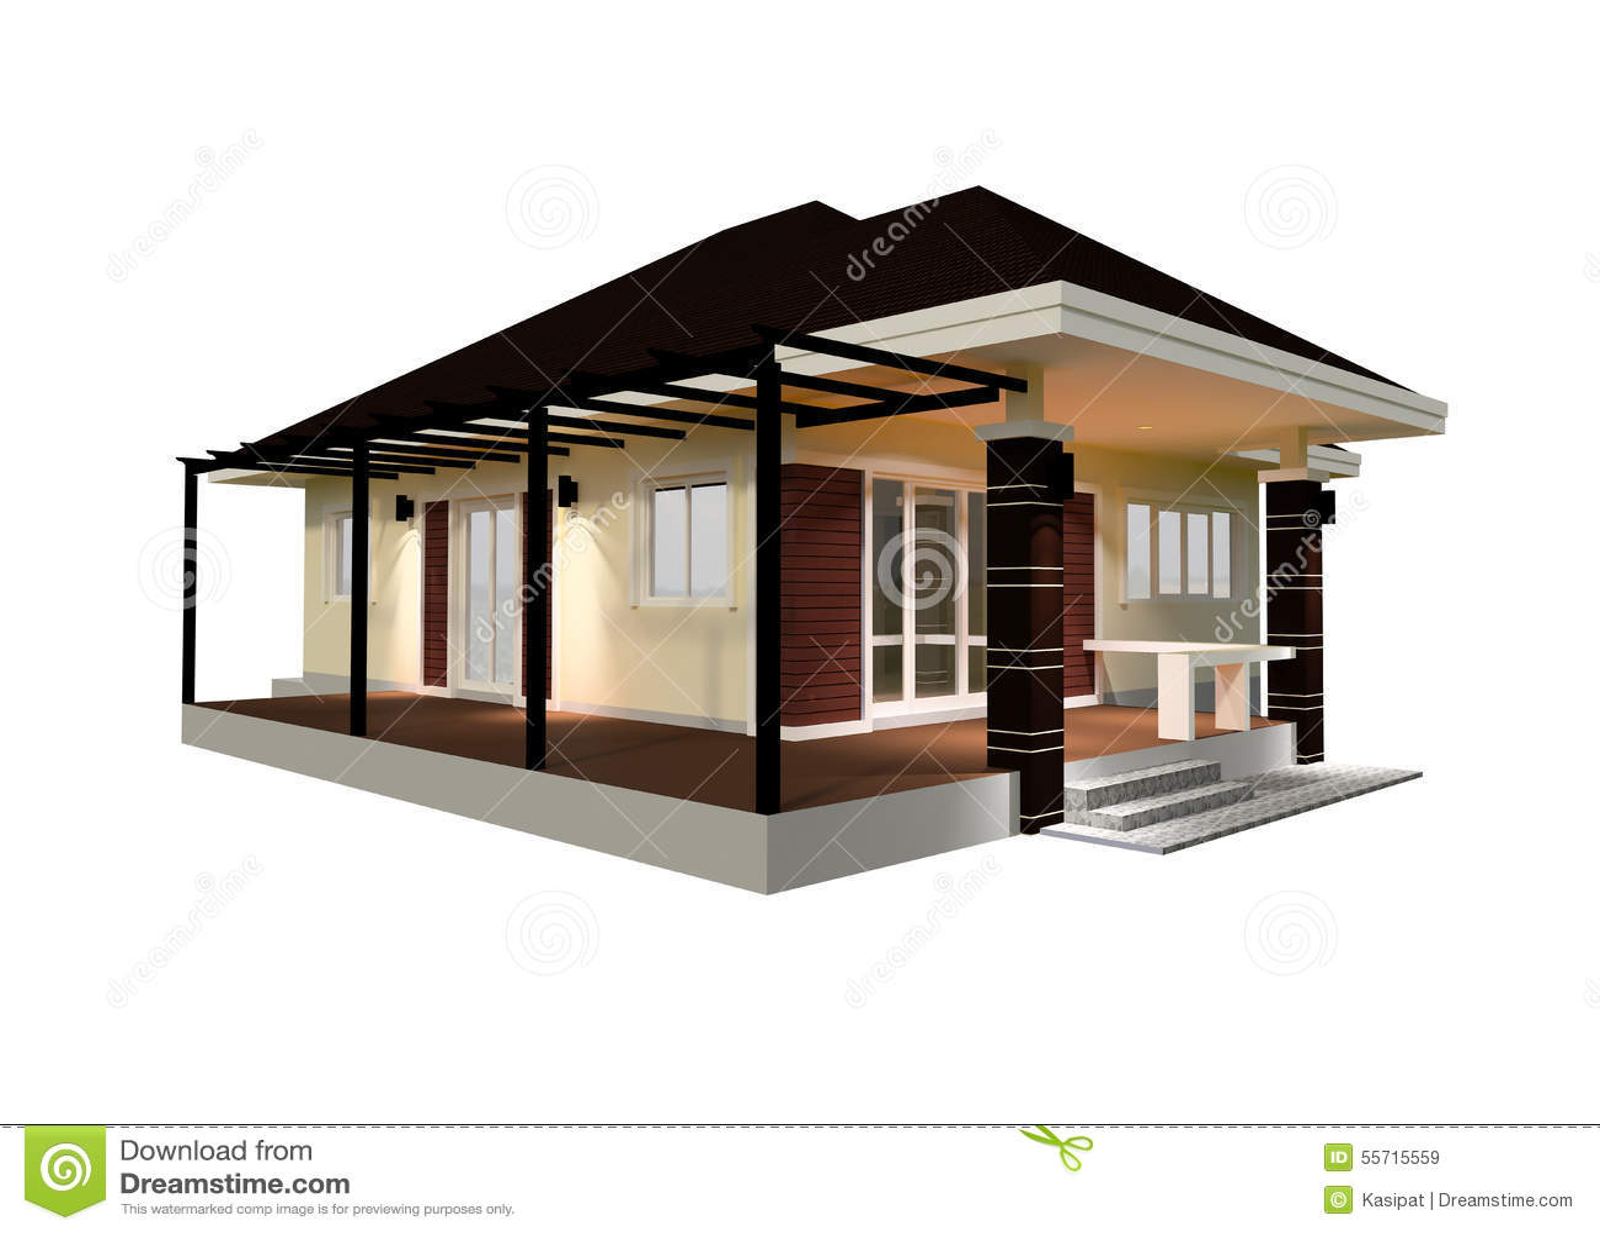 illustration de la chambre 3d de plan - Dessin Chambre 3d